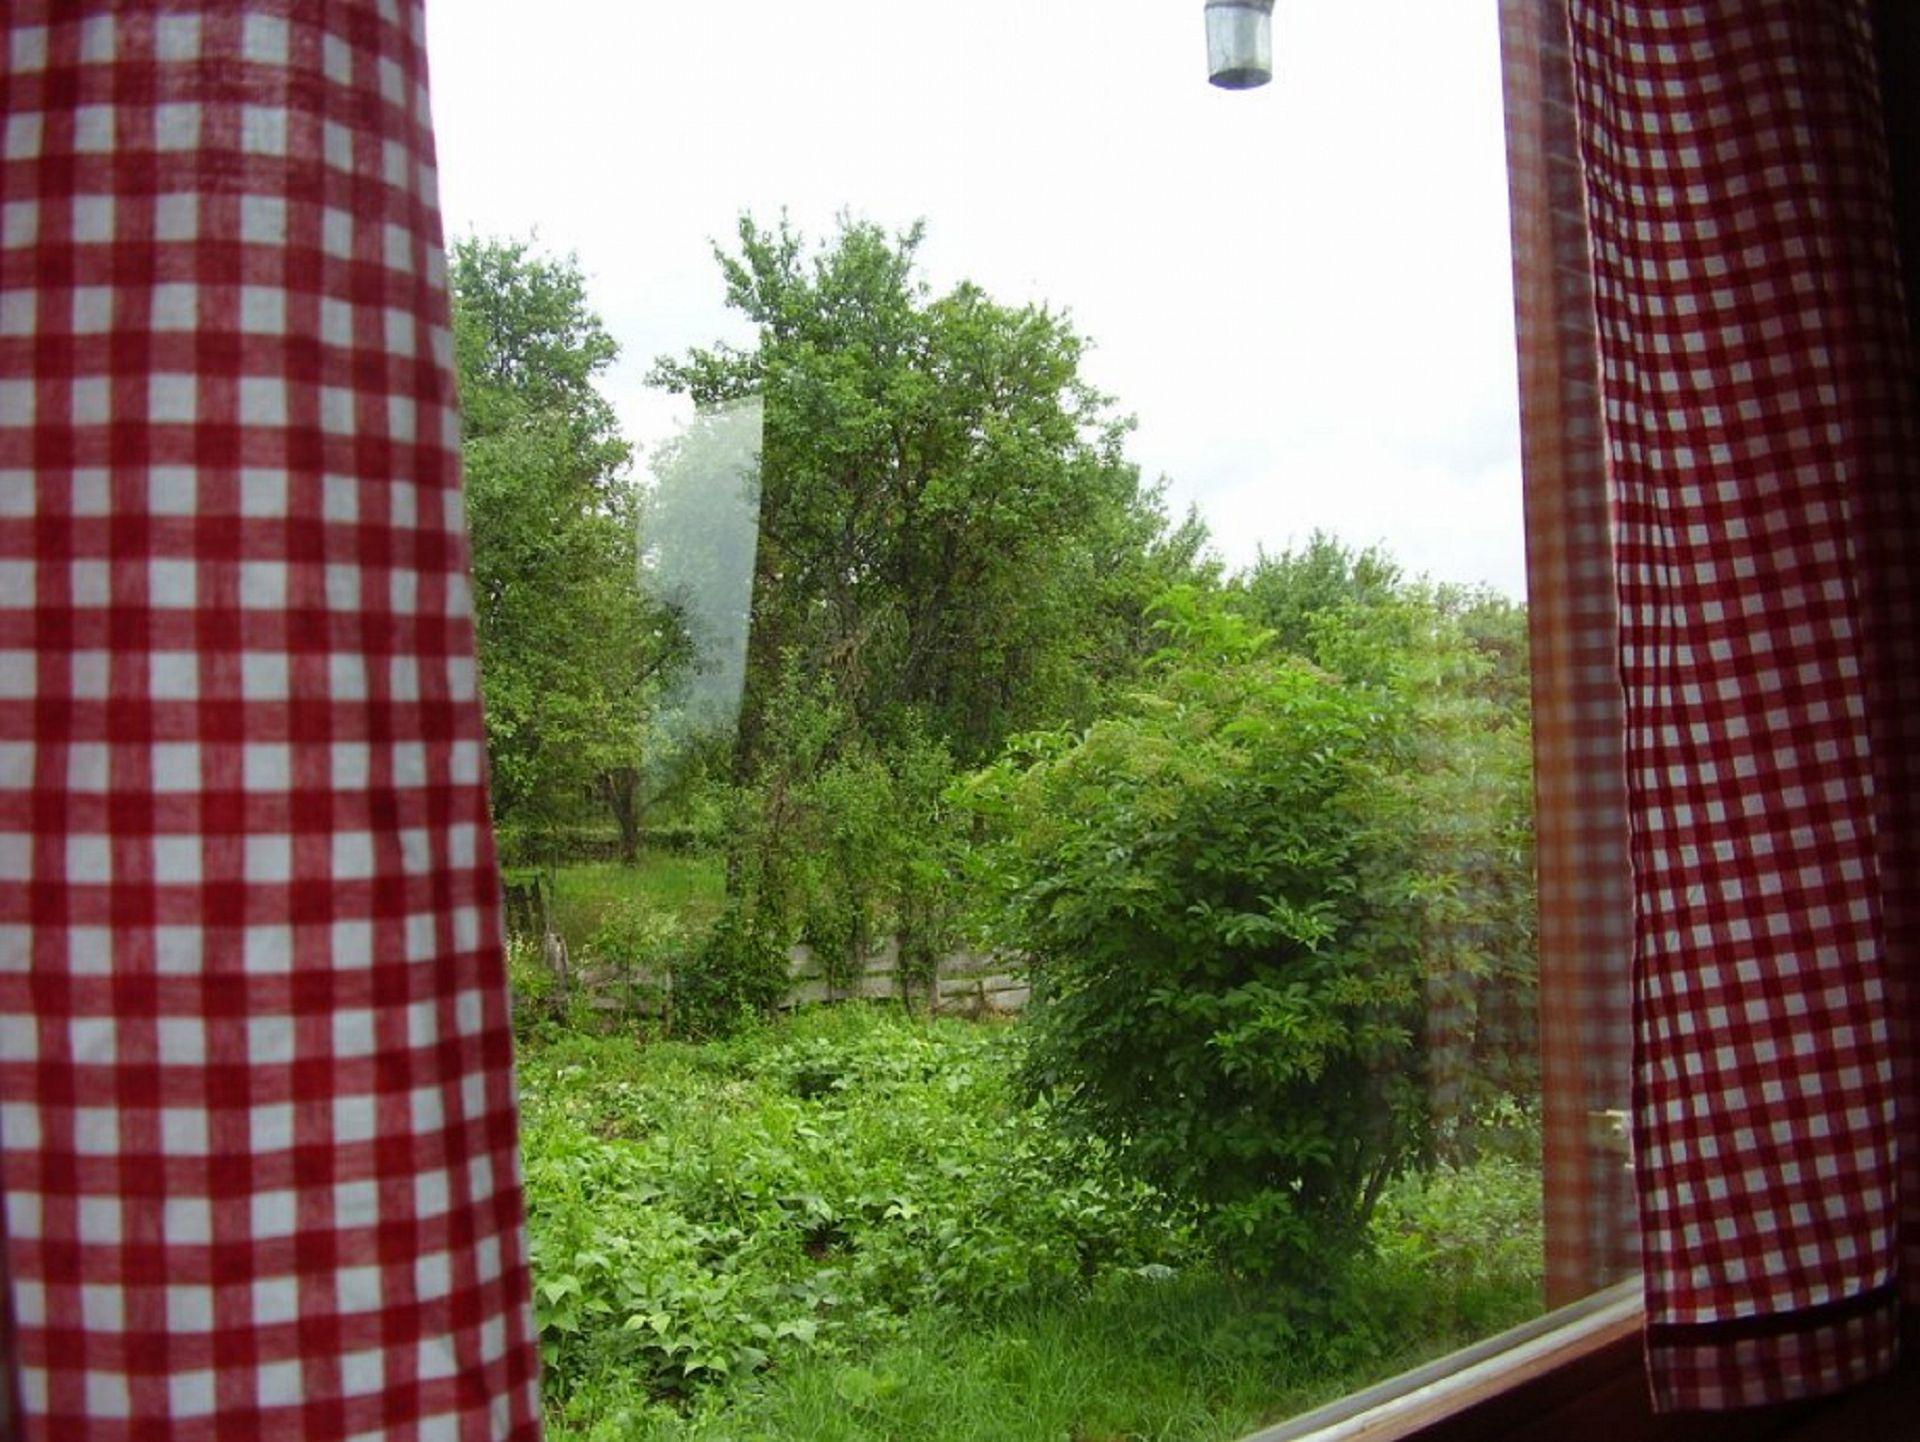 Biserka - Gacka dolina - Maisons de repos, villas Croatie - H(4+2): détail